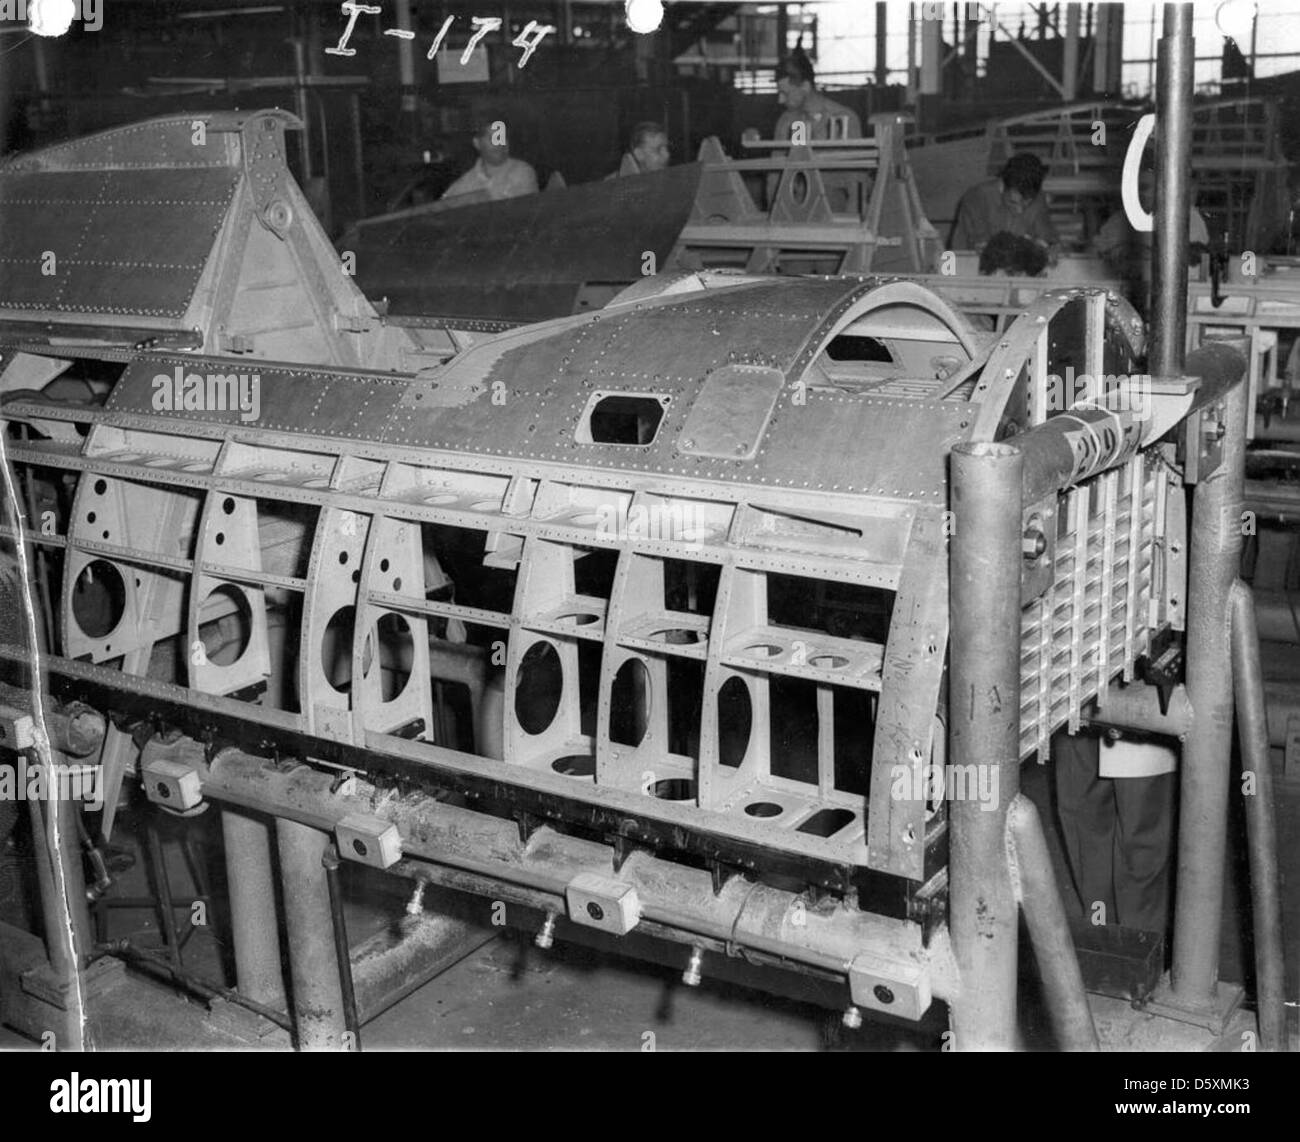 Republic P-47B 'Thunderbolt' center fuselage assemby. - Stock Image